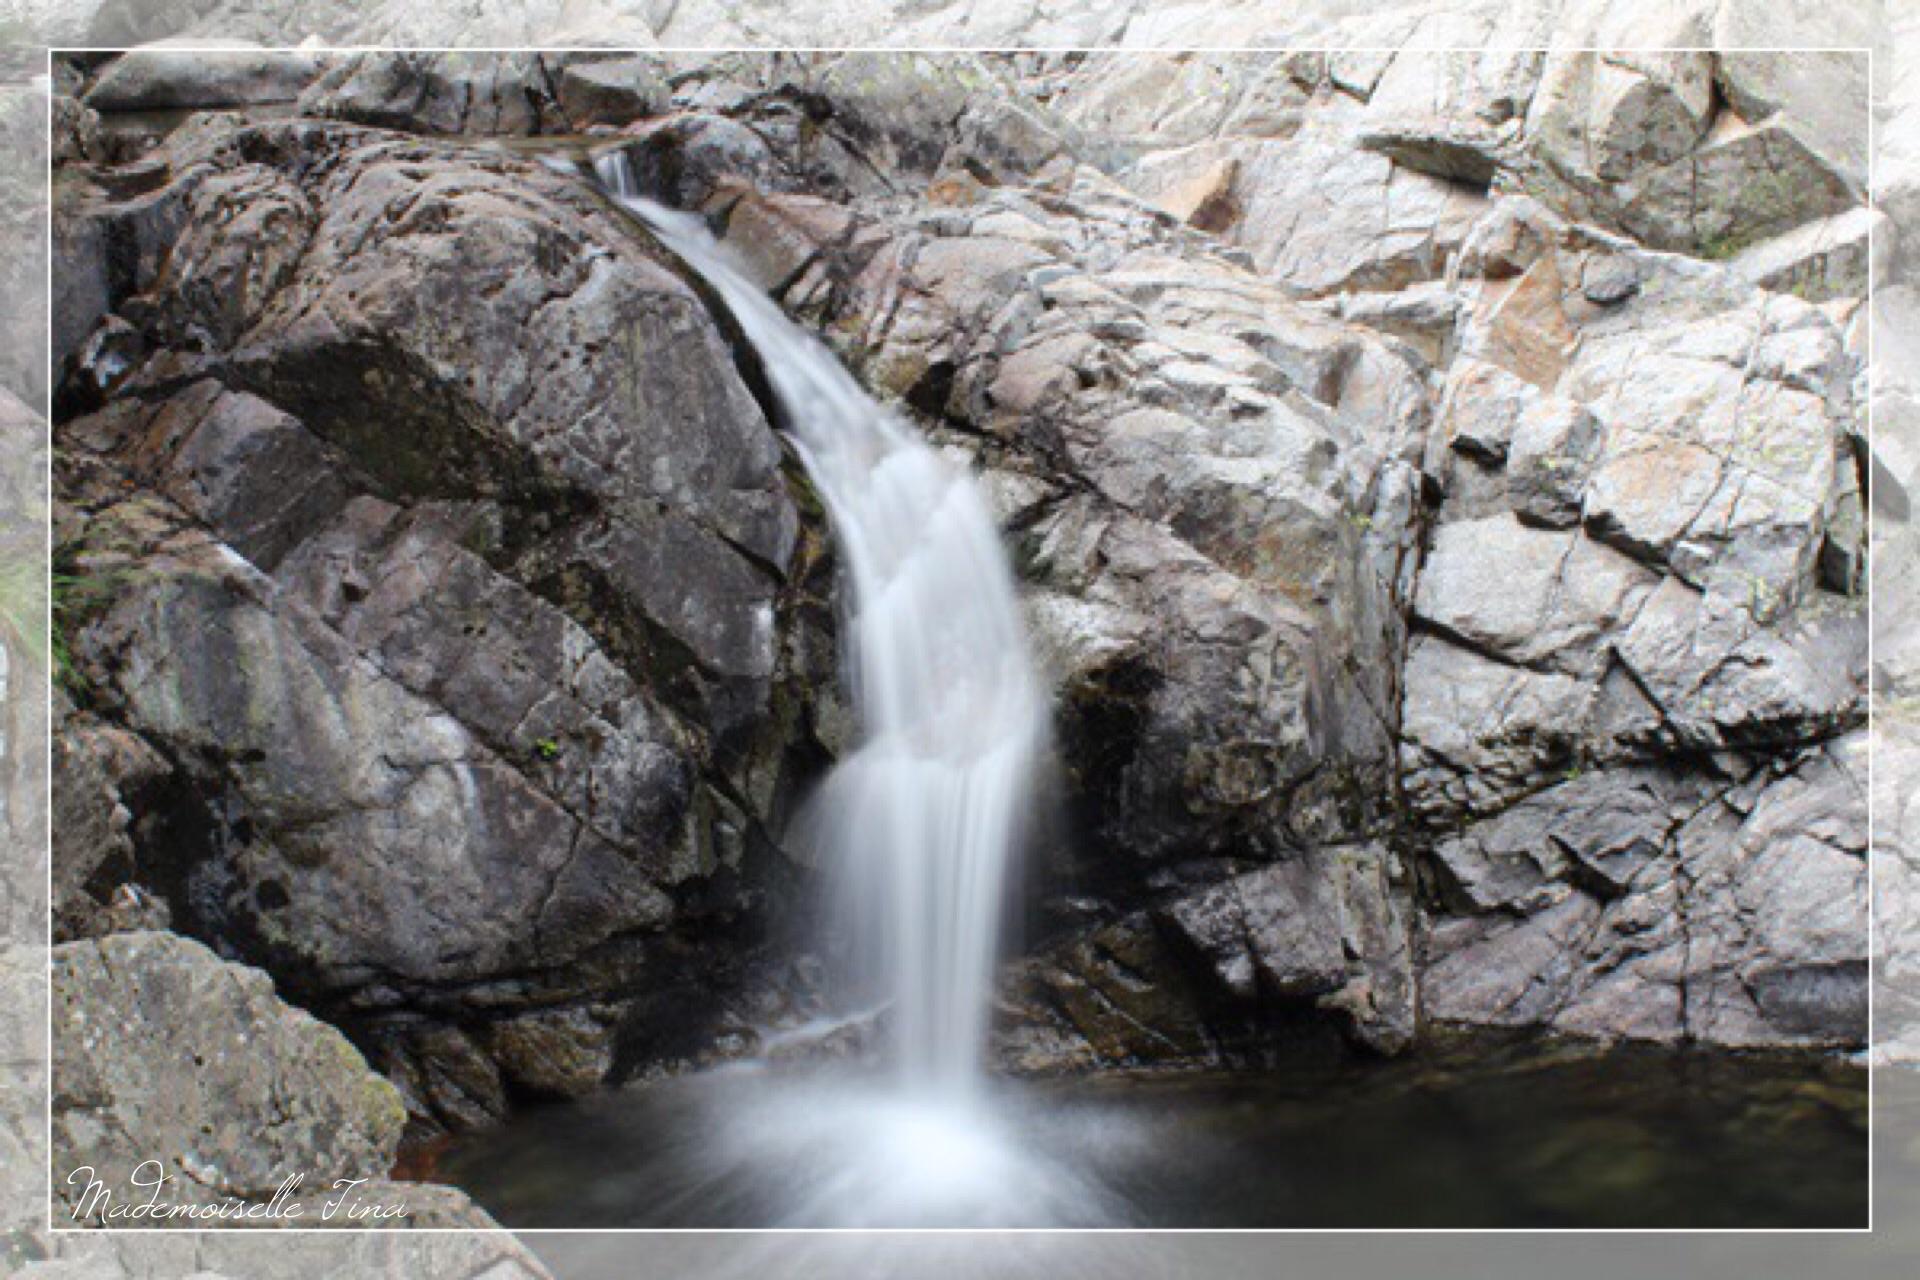 La cascade des anglais - Vizzavona